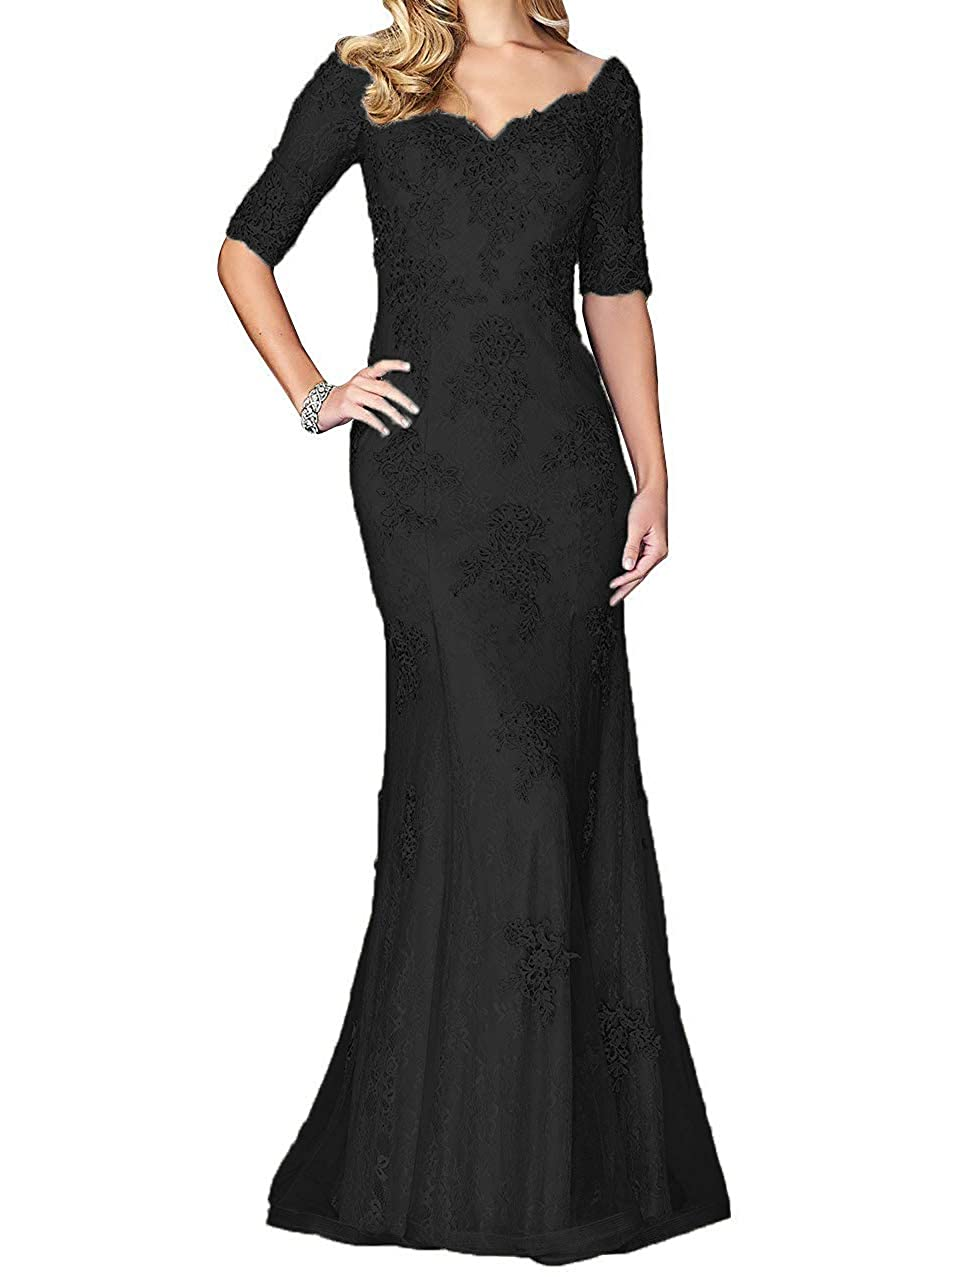 Black tutu.vivi Women's V Neck Lace Appliques Mermaid Mother of The Bride Dresses Half Sleeves Long Prom Dresses